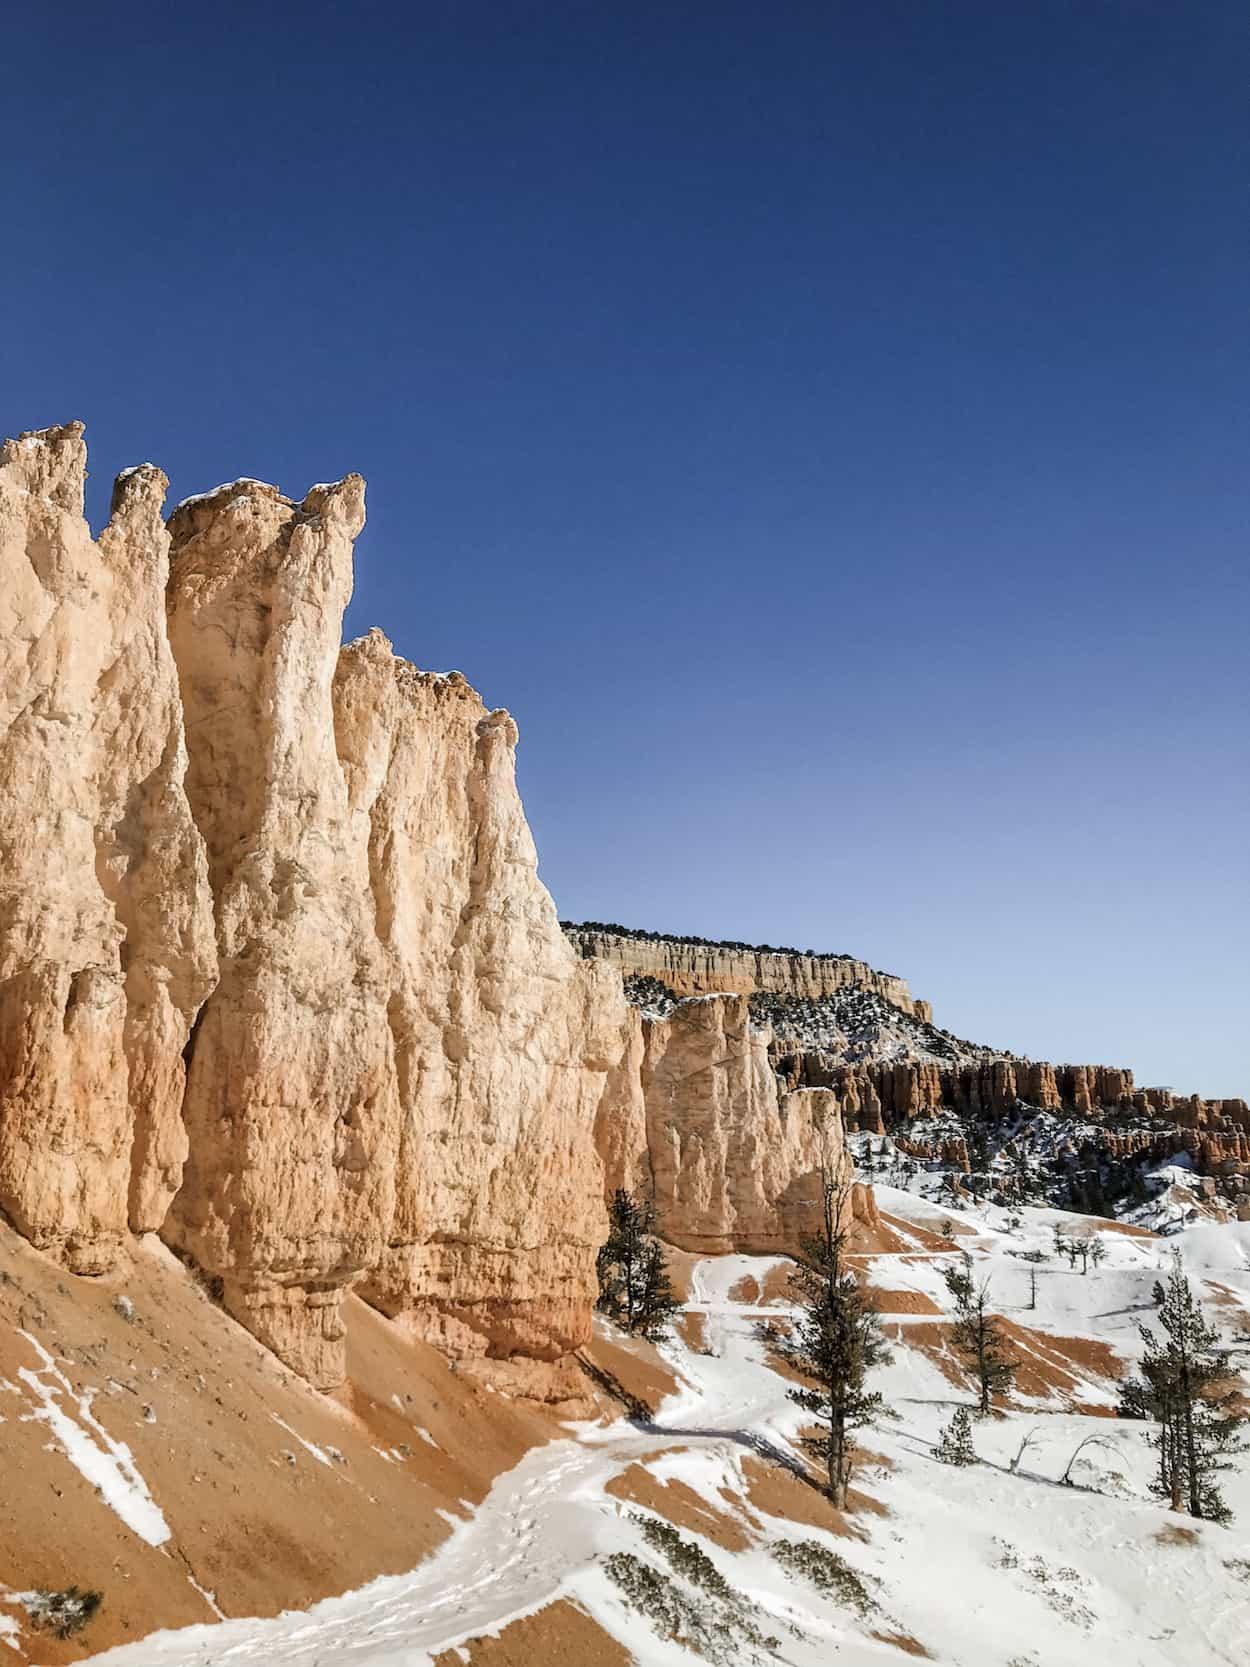 Views of Bryce Canyon National Park, Utah during the winter season